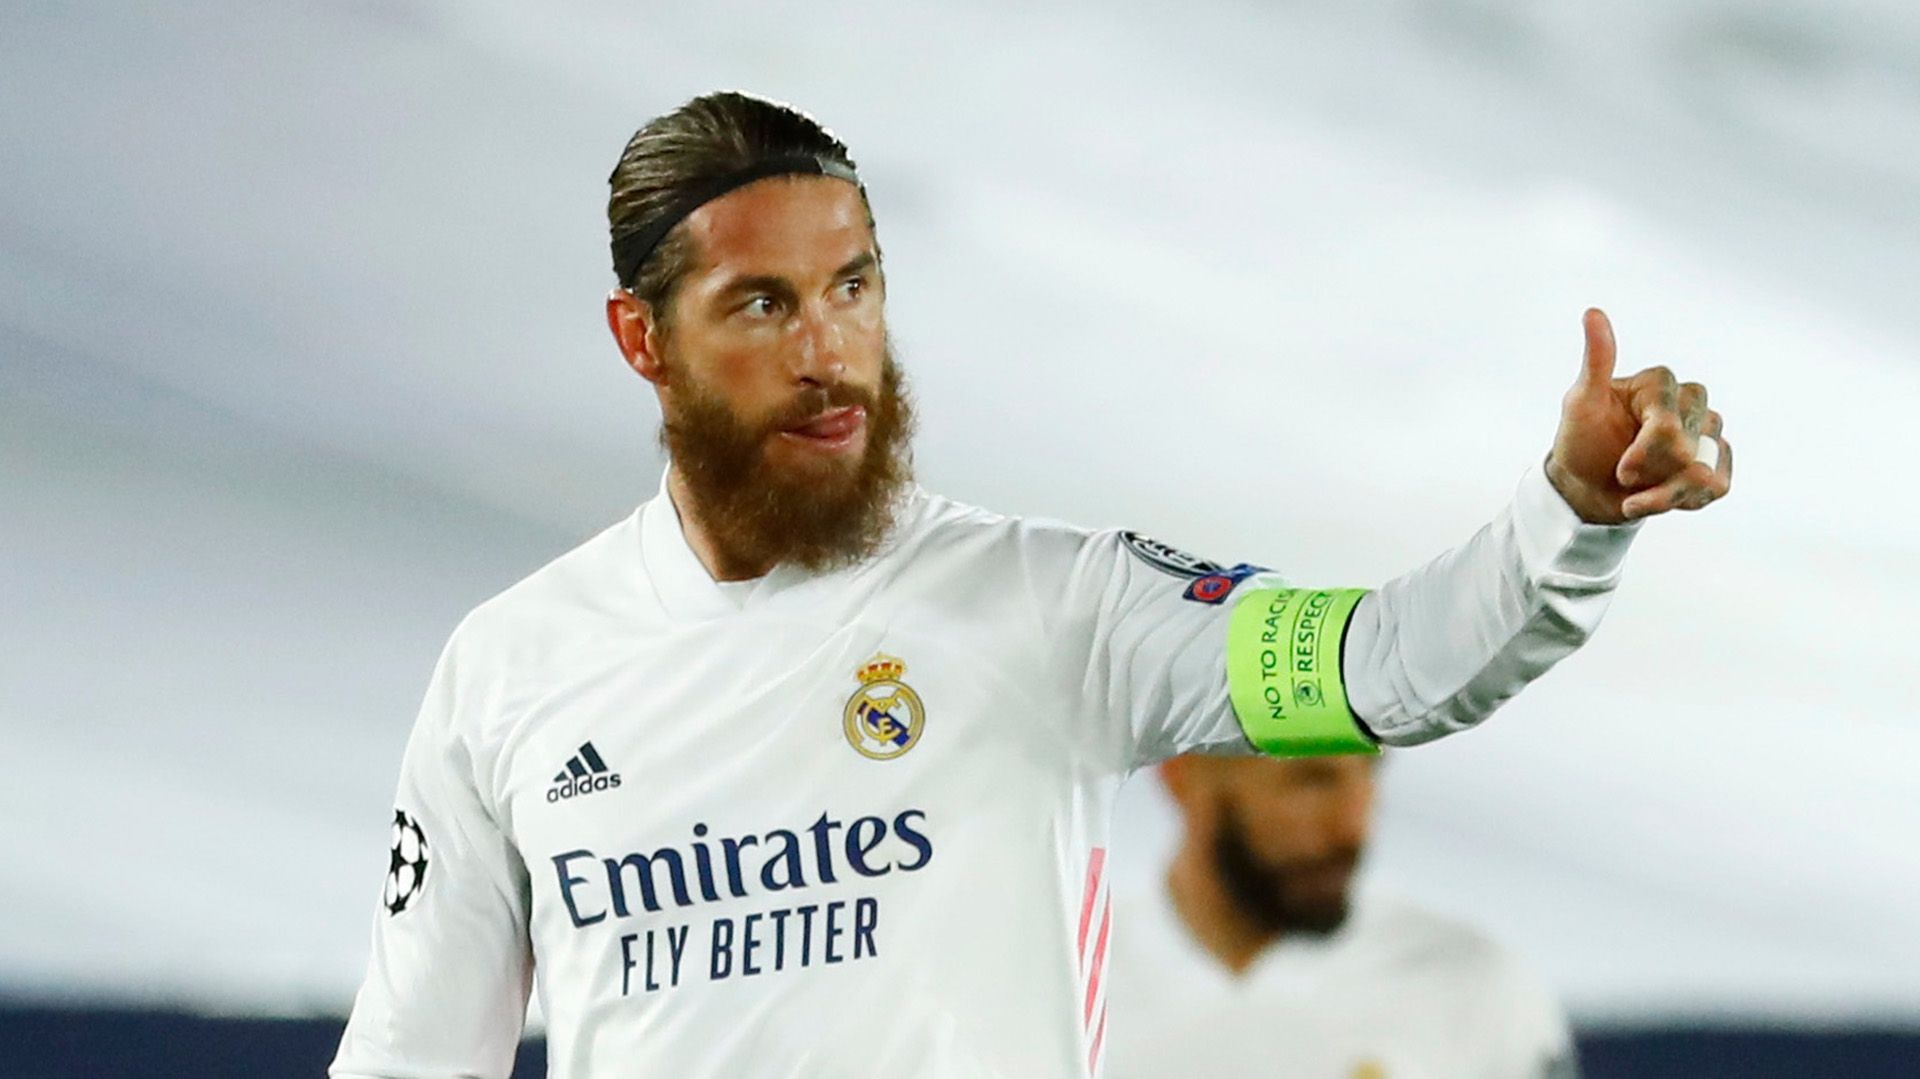 Champions League - Group B - Real Madrid v Inter Milan